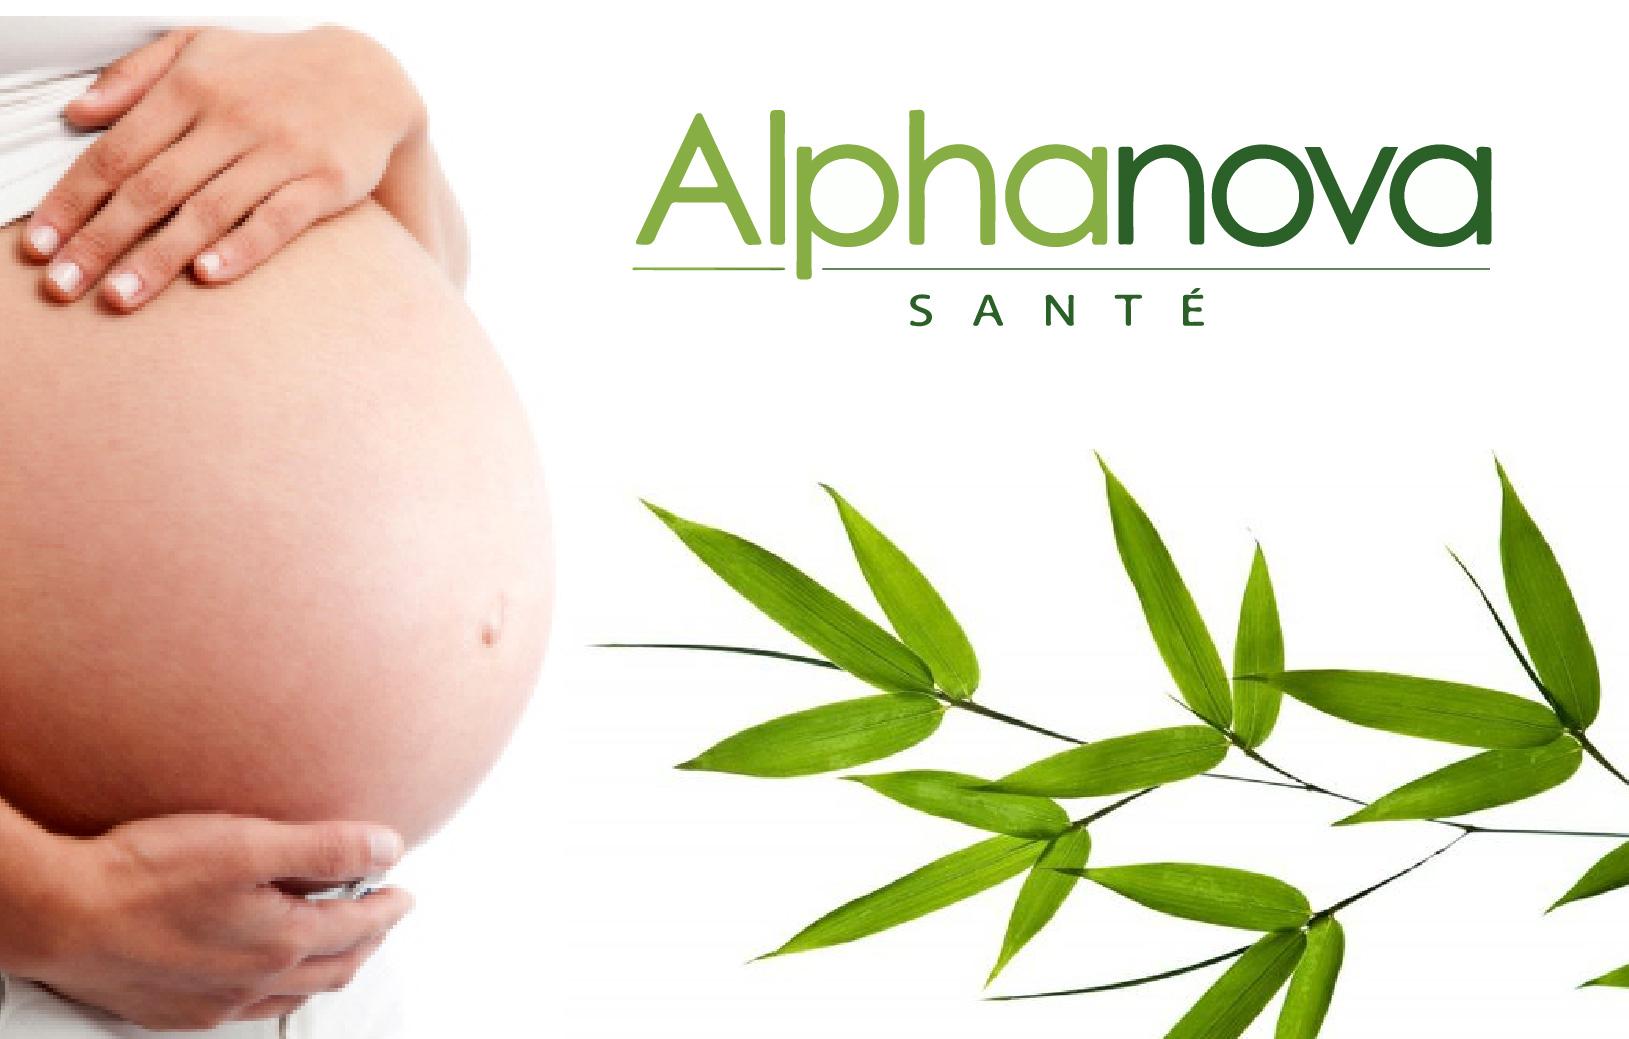 alphanova-sante